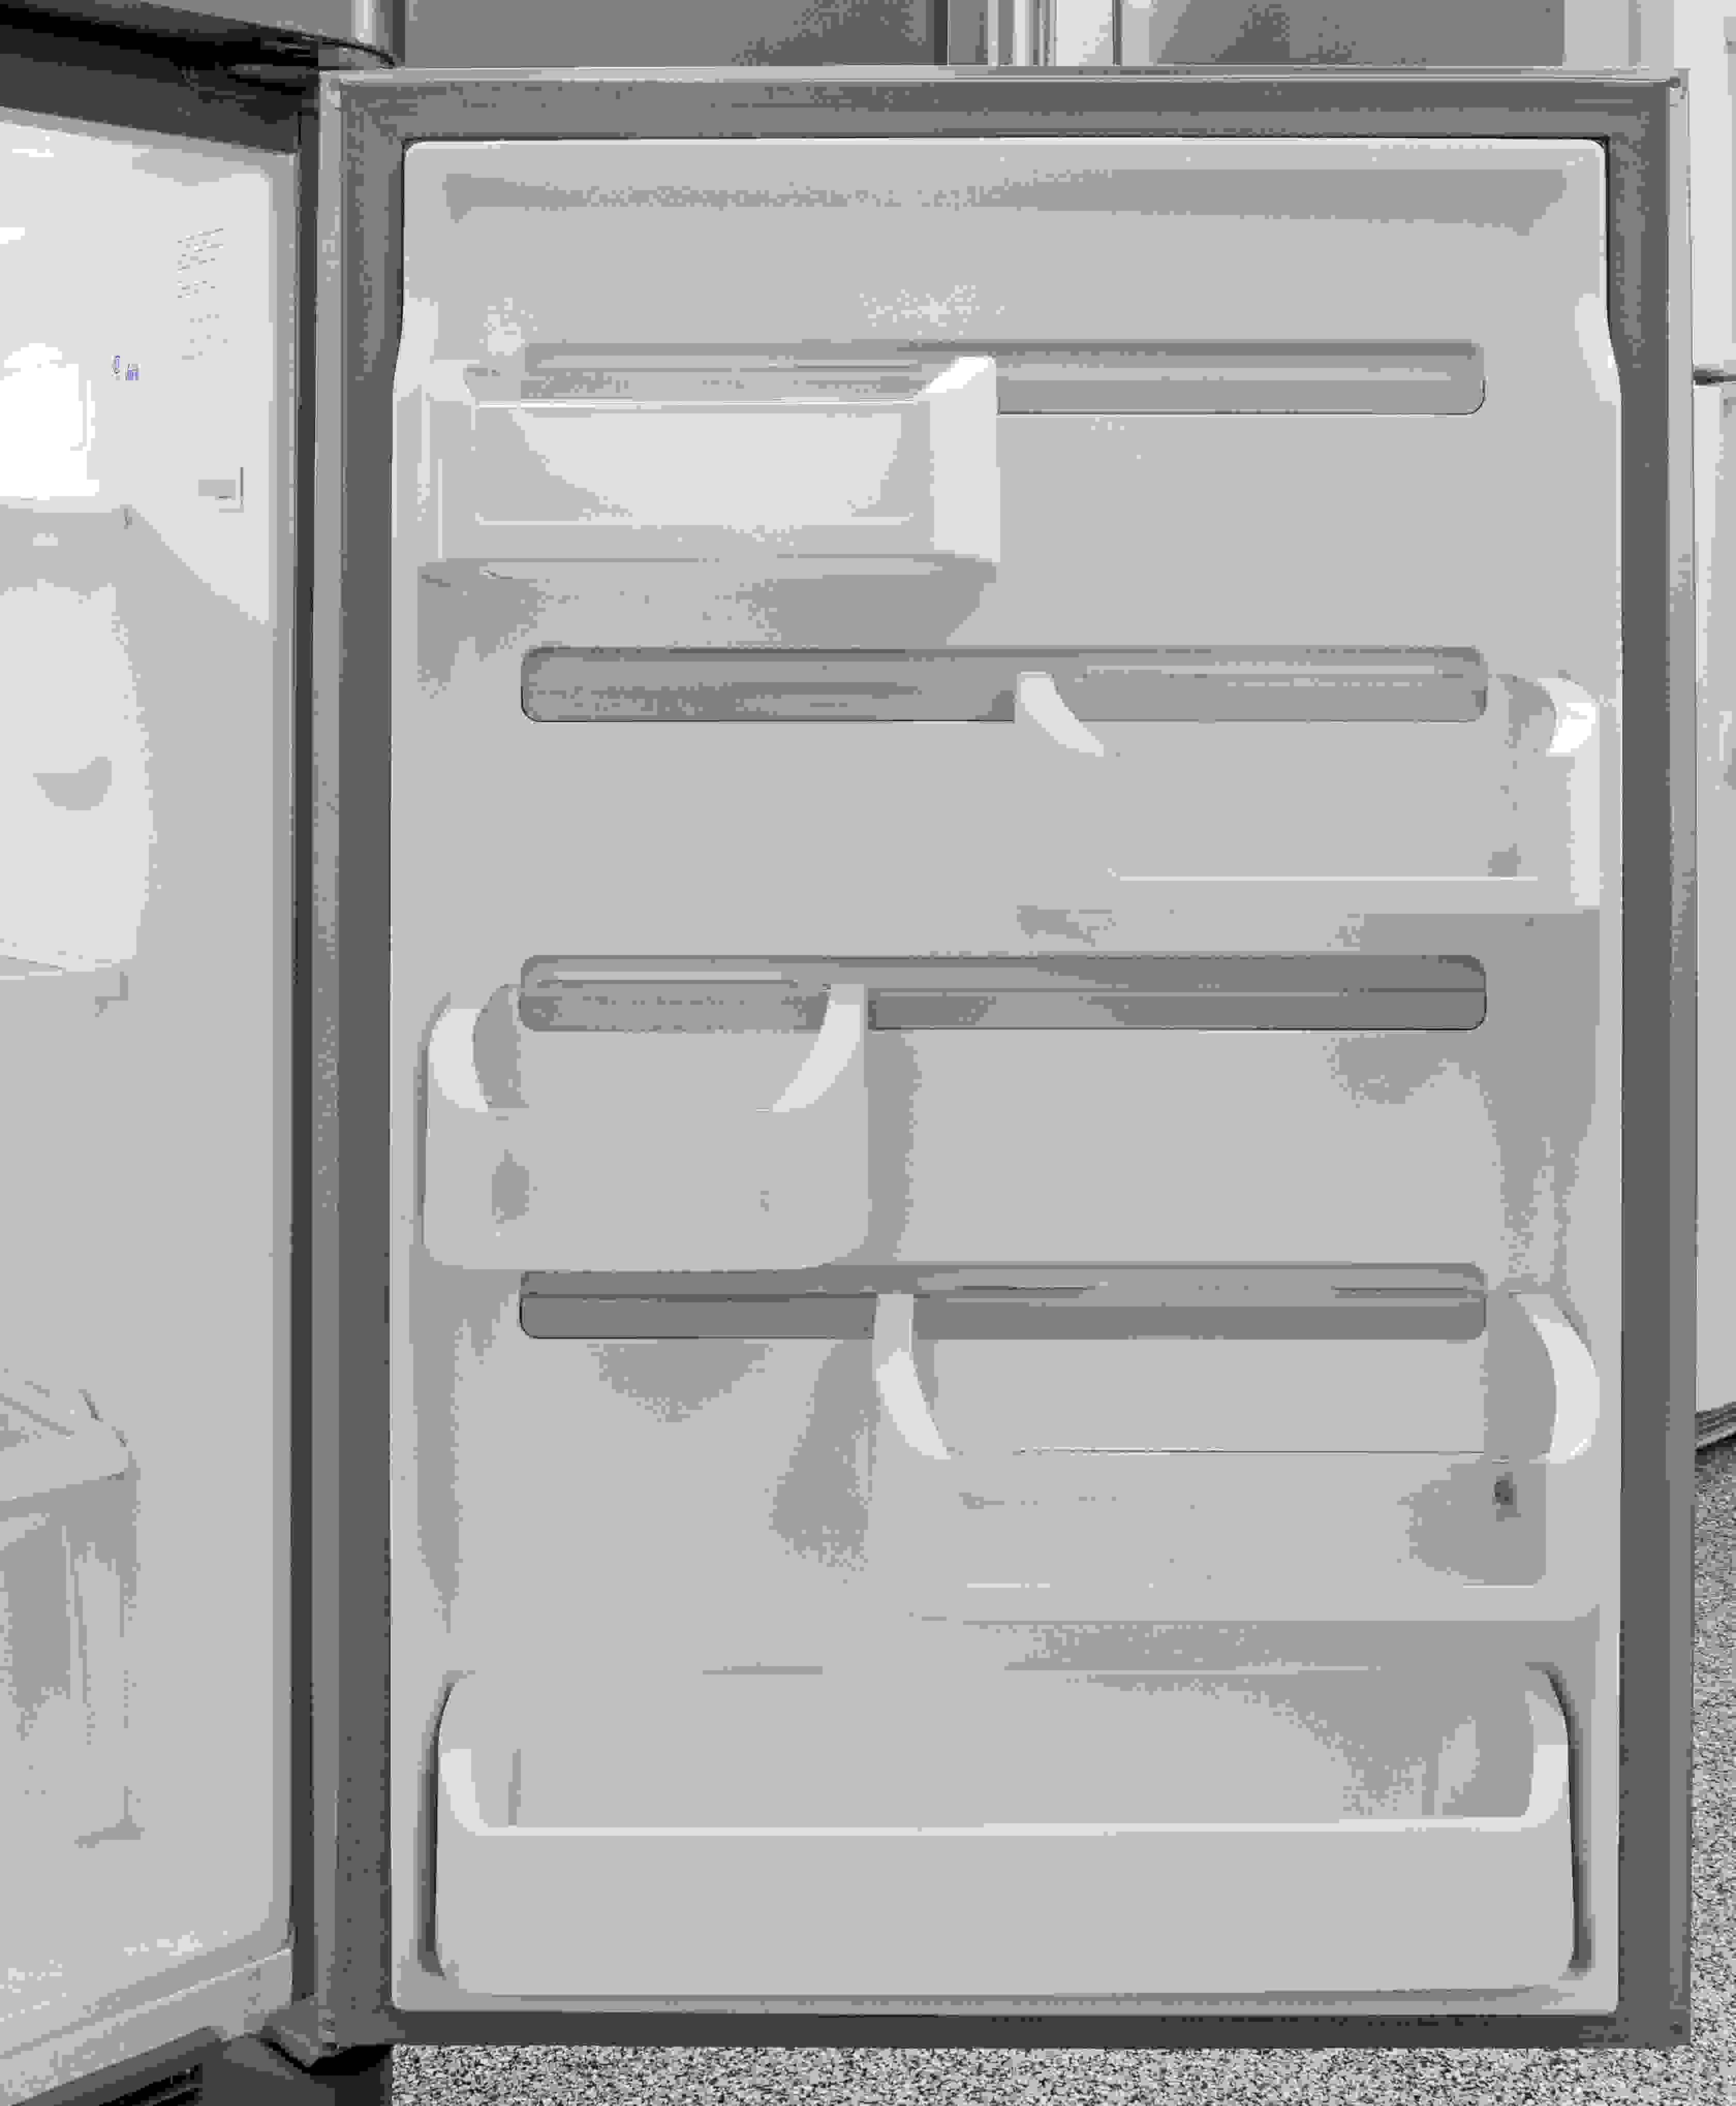 Sliding bucket shelves provide flexible door storage in the Frigidaire Gallery FGTR1845QF.